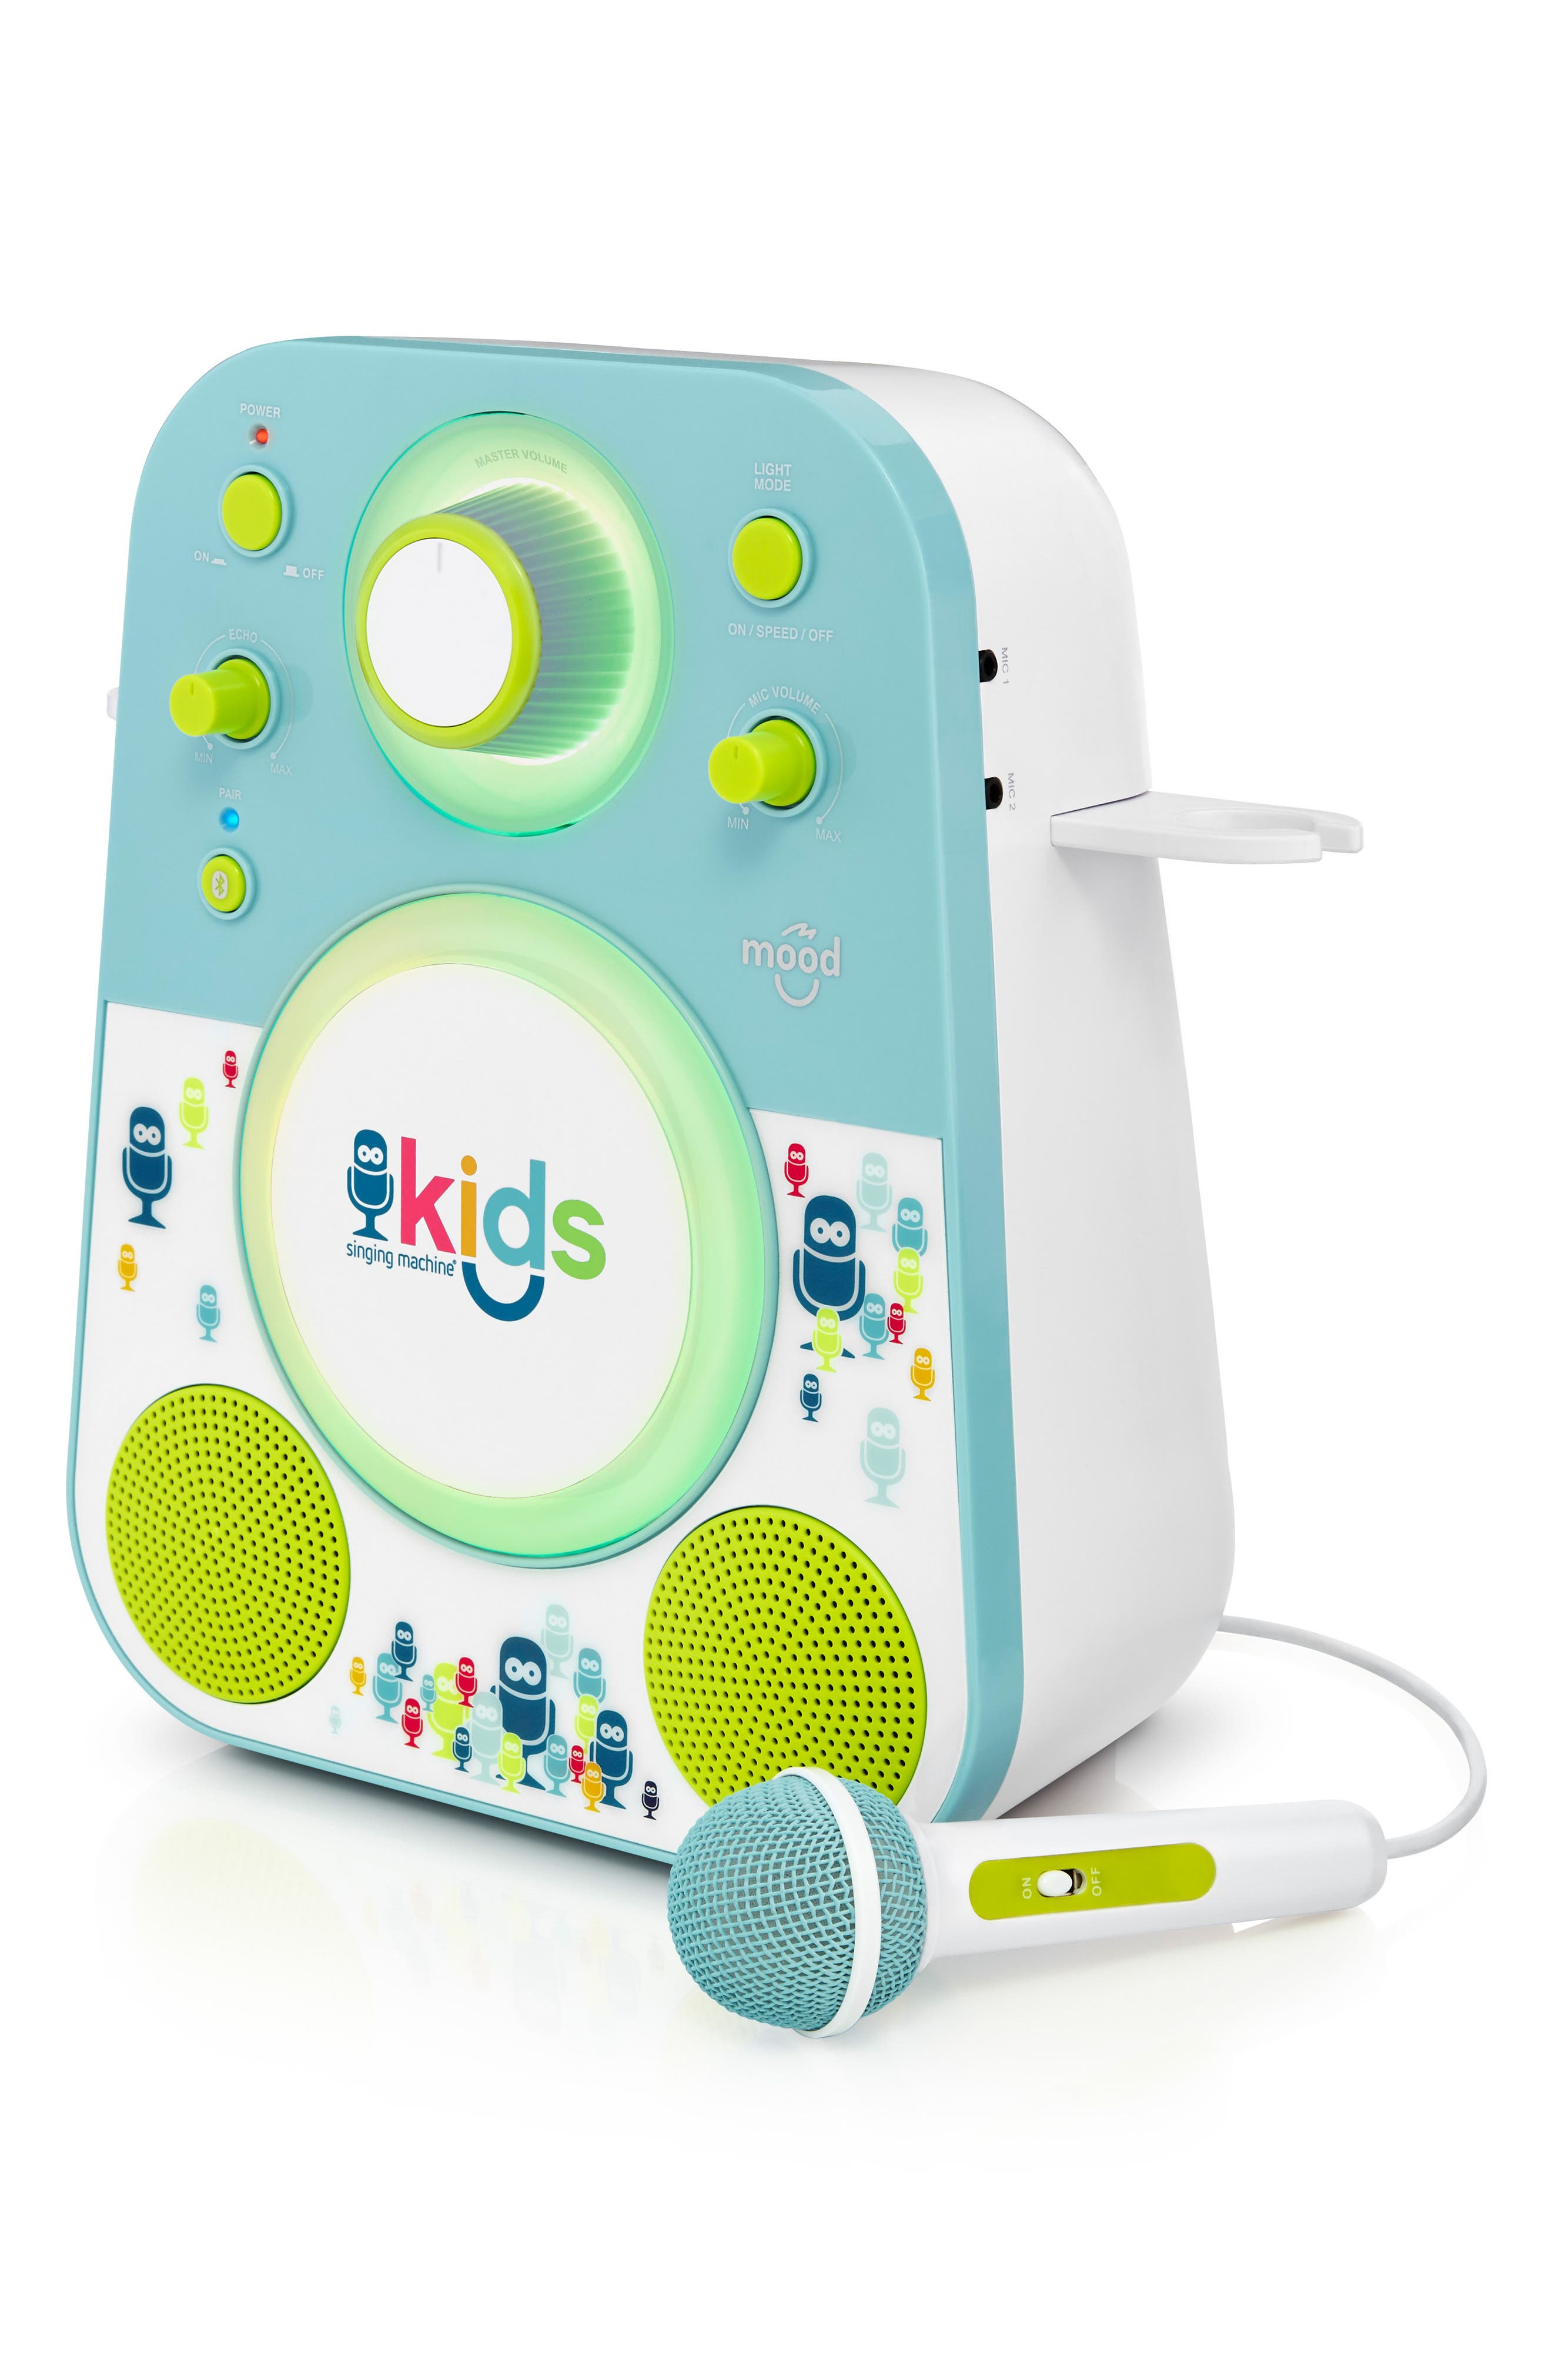 Kids Mood Karaoke System,                             Alternate thumbnail 4, color,                             BLUE GREEN